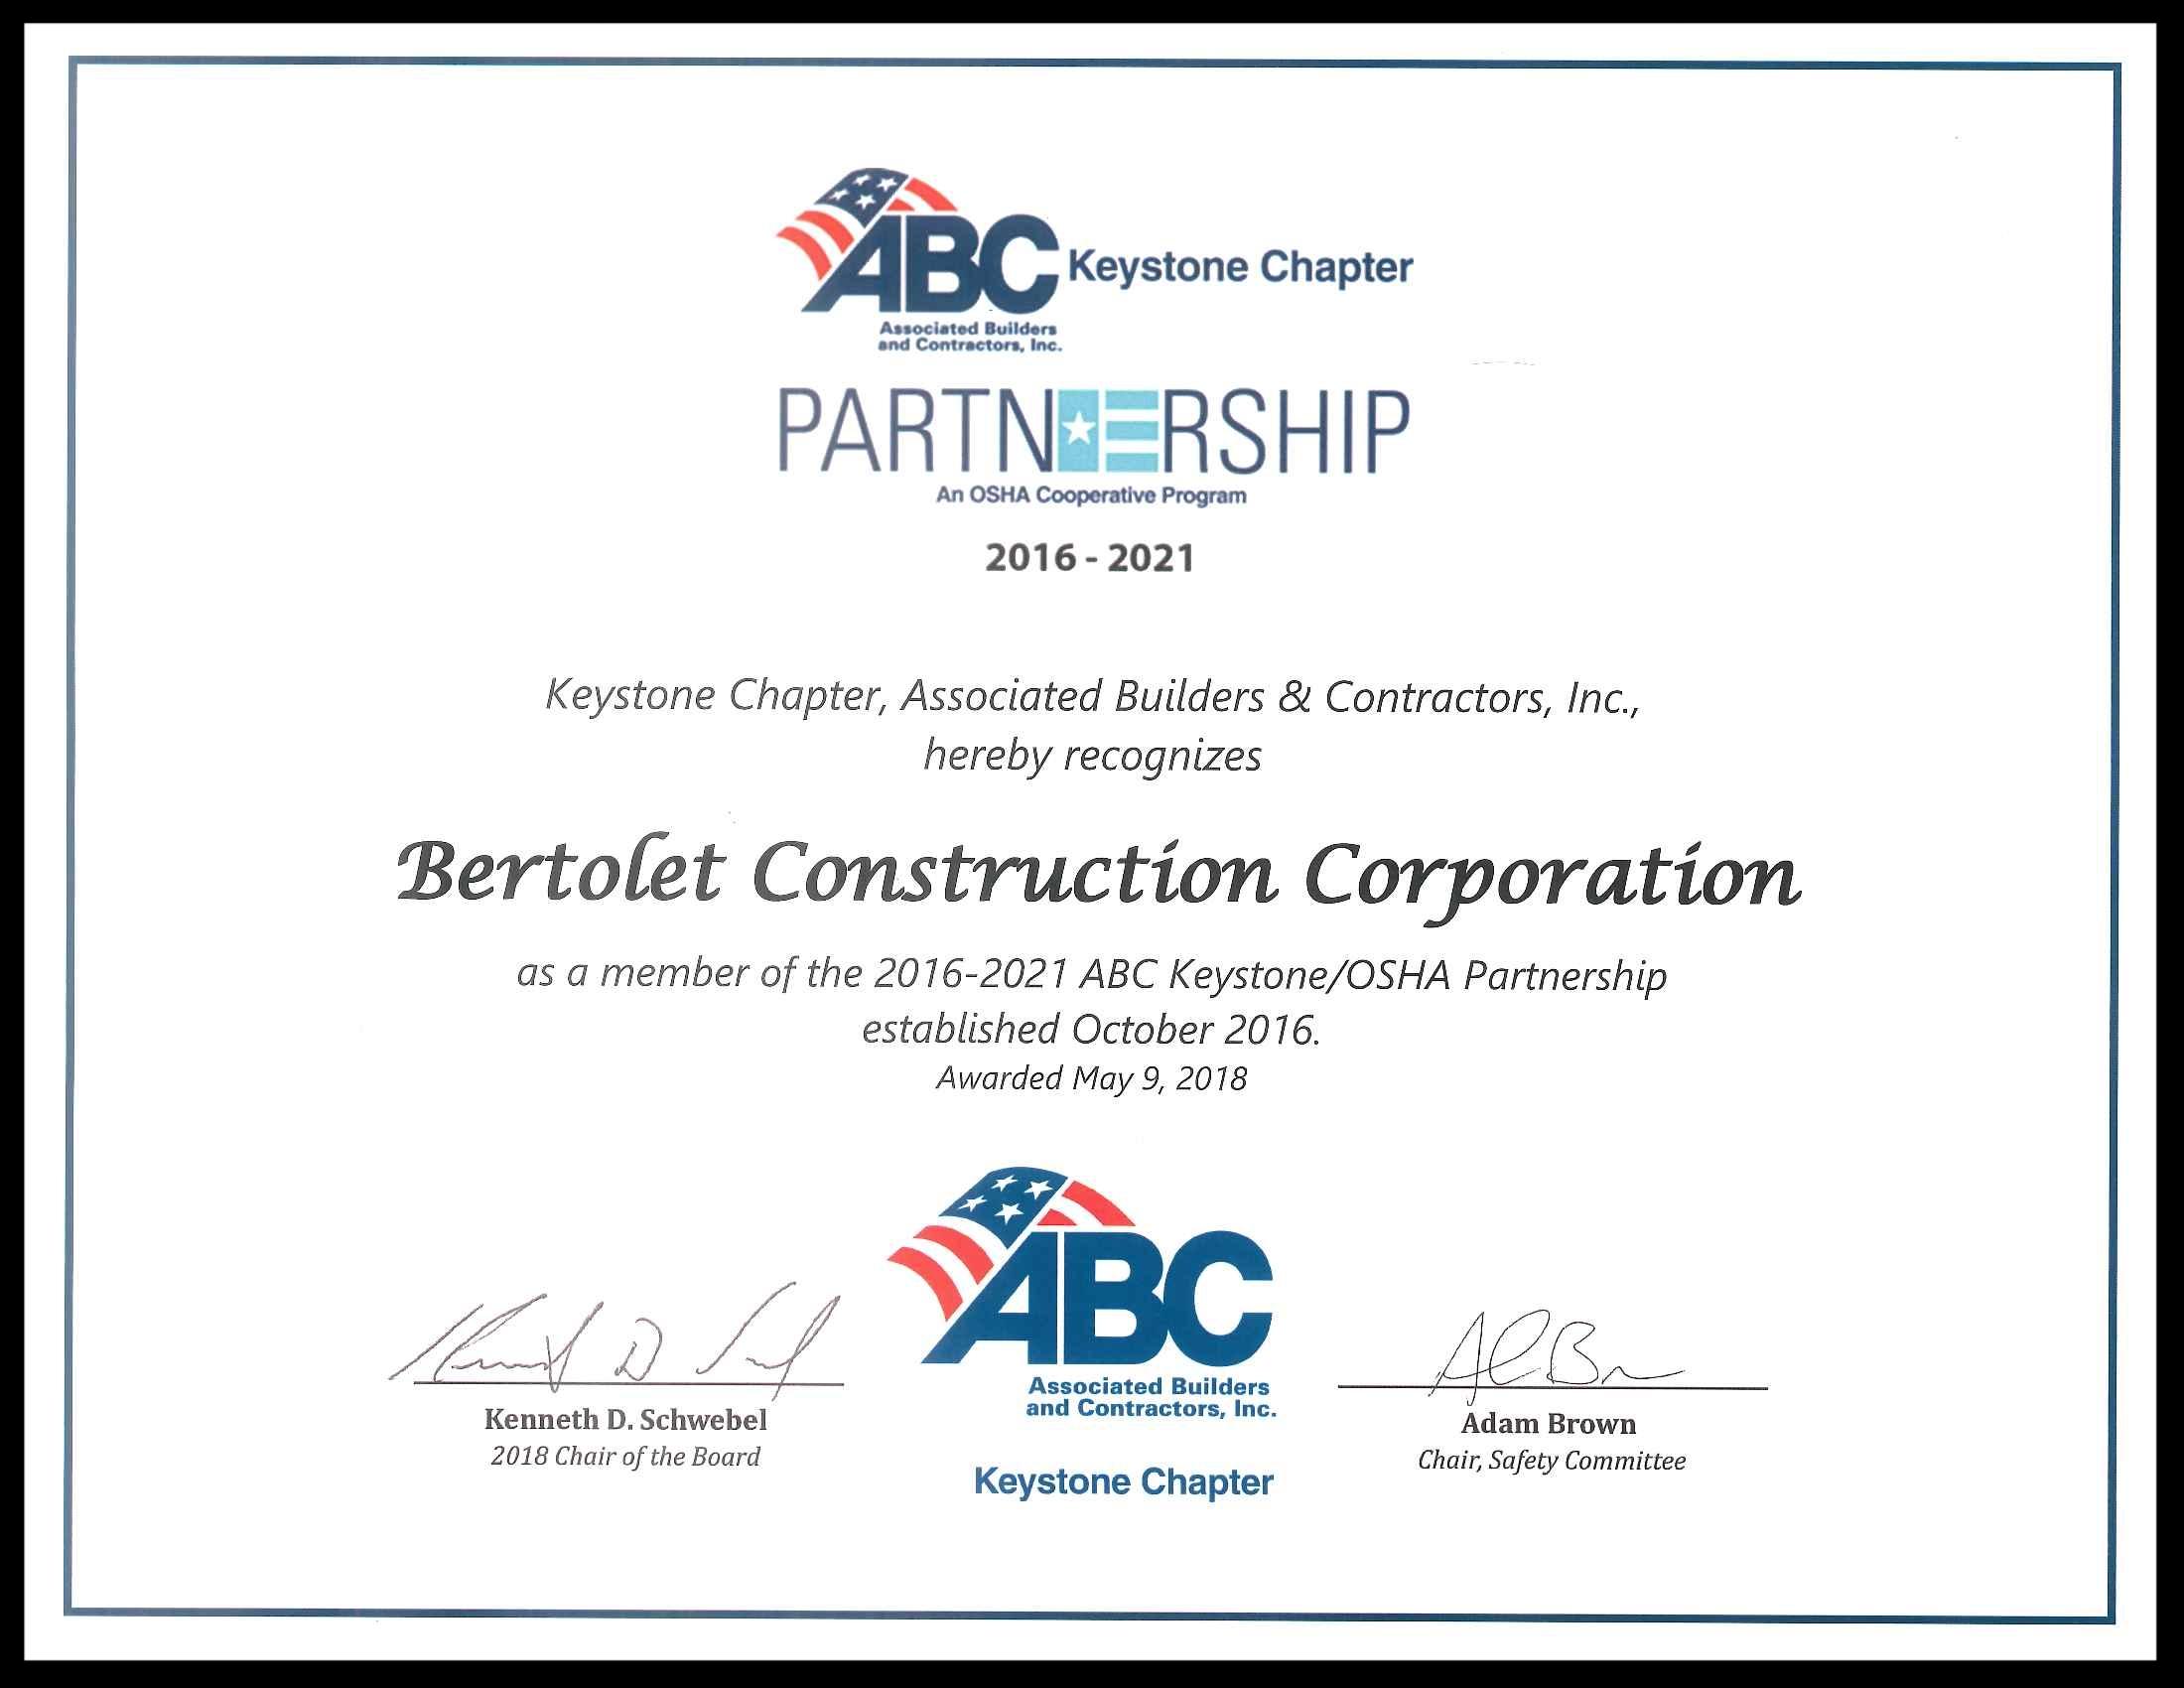 Associate Builders and Contractors, Inc. Partnership Certificate